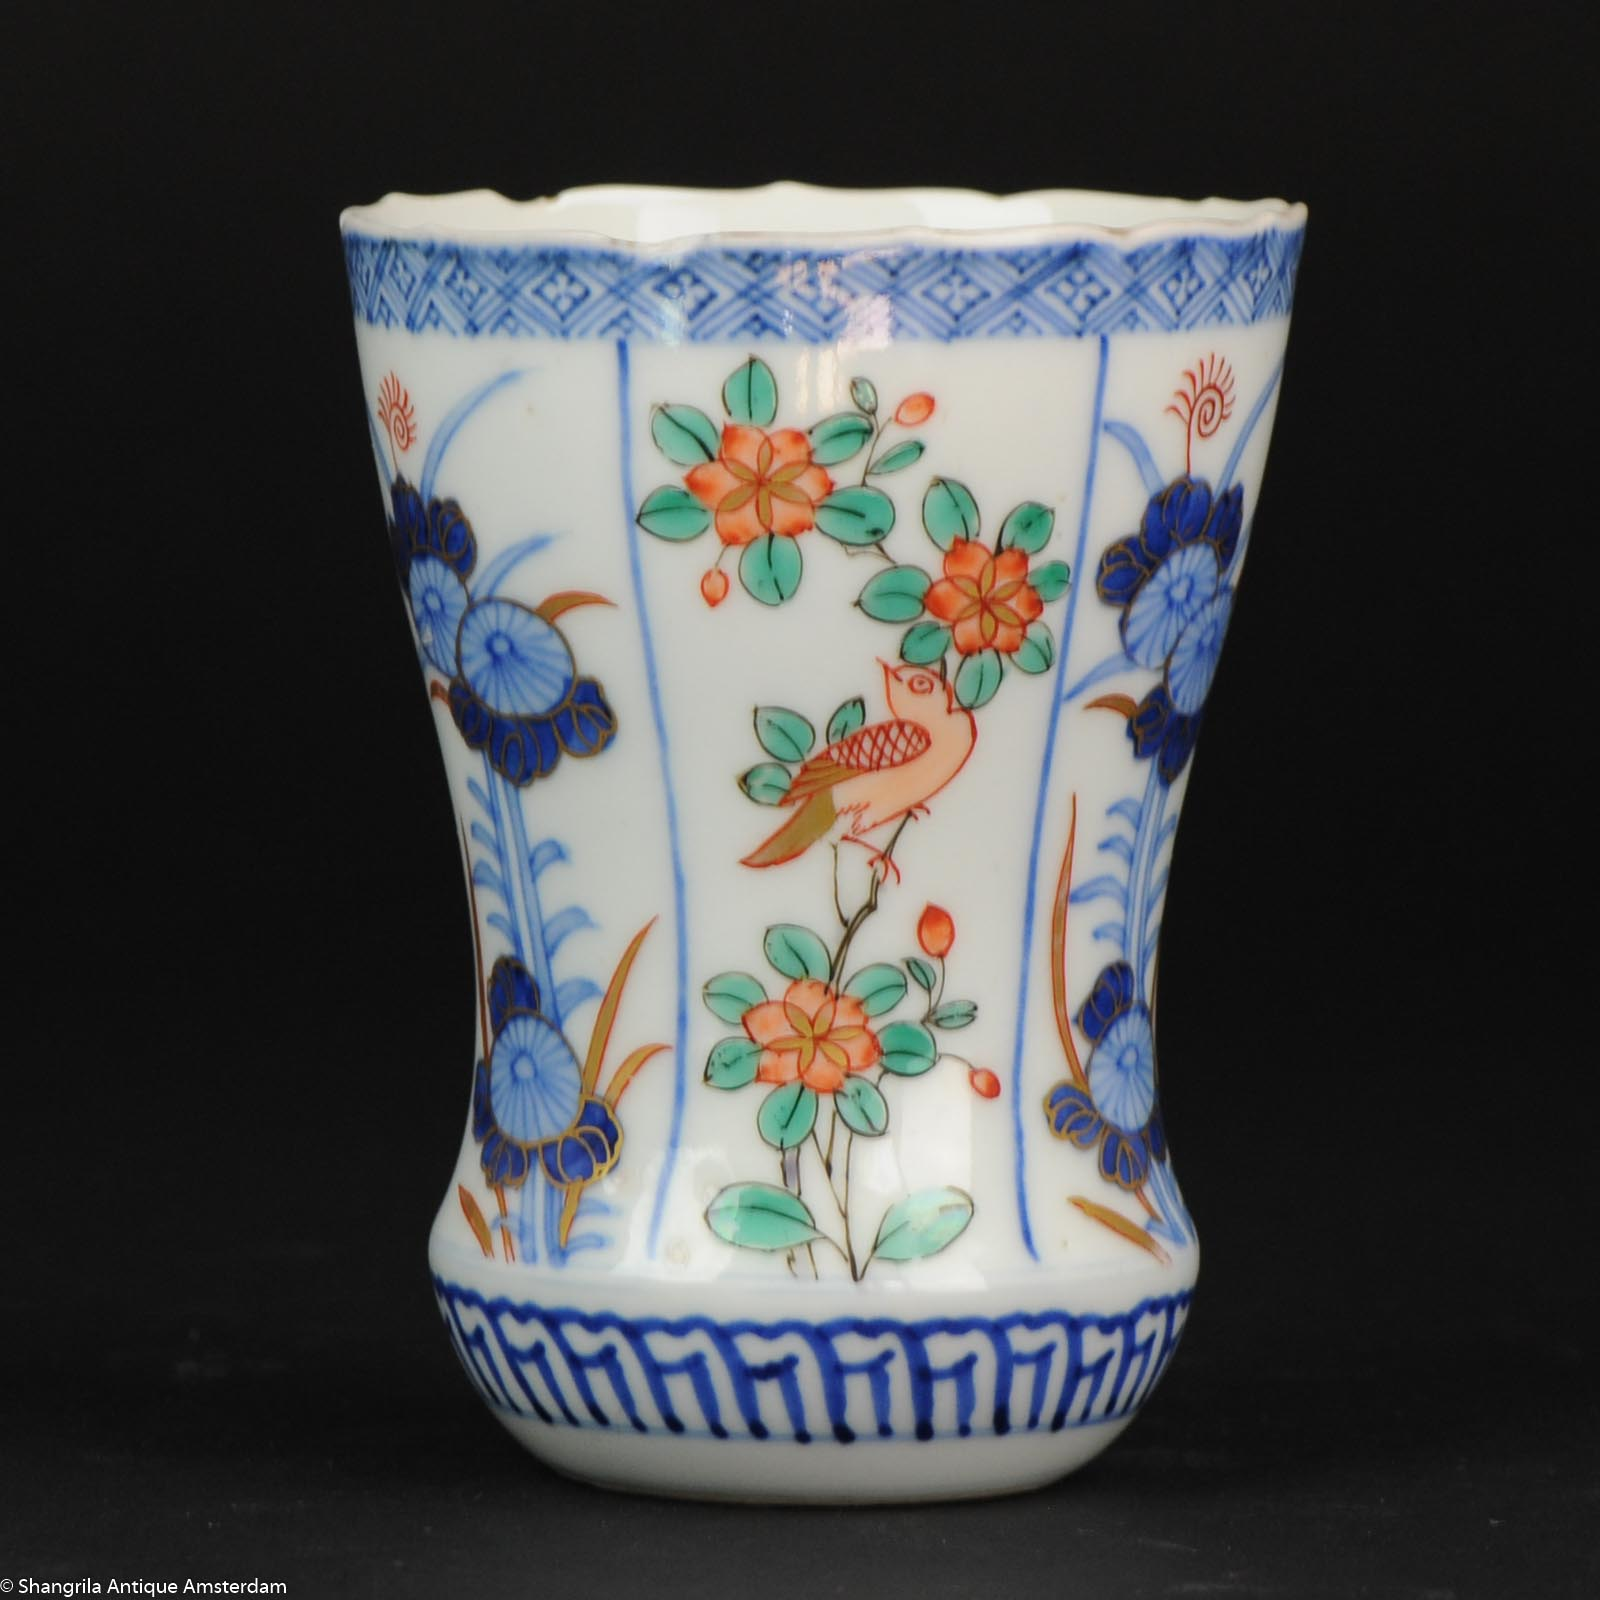 Antique edo meiji period japanese porcelain vase japan flowers antique edo meiji period japanese porcelain vase japan flowers polychome bird gold reviewsmspy